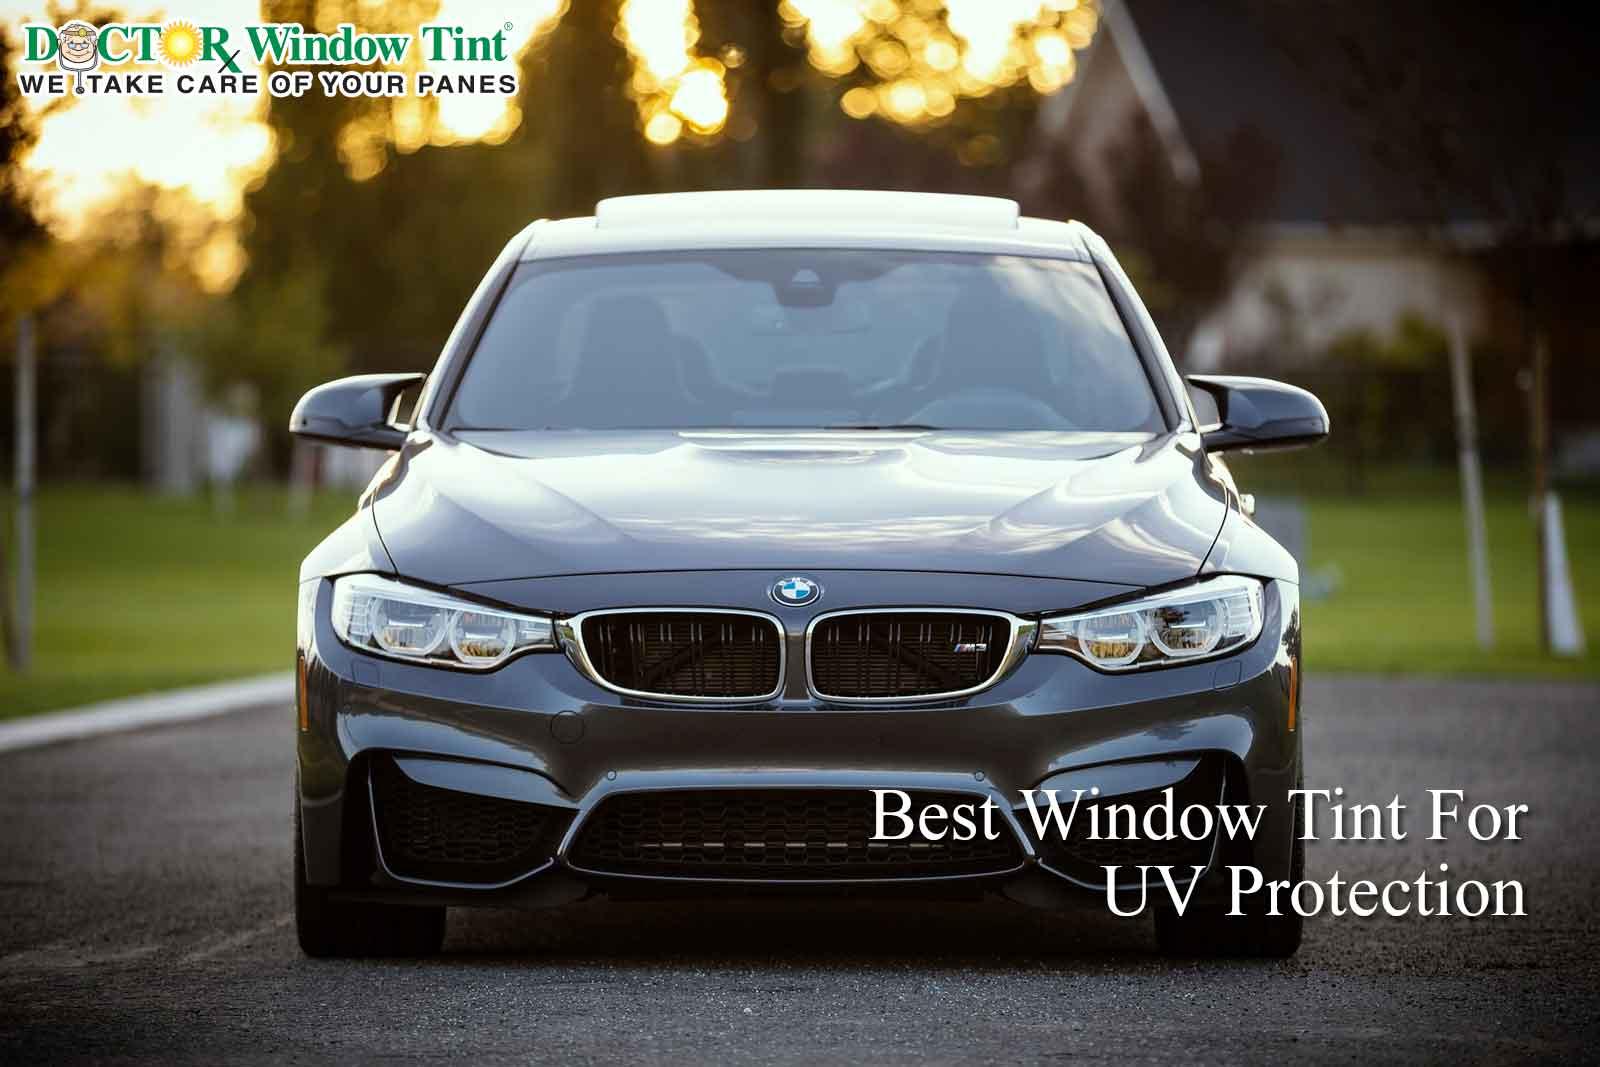 Best-Window-Tint